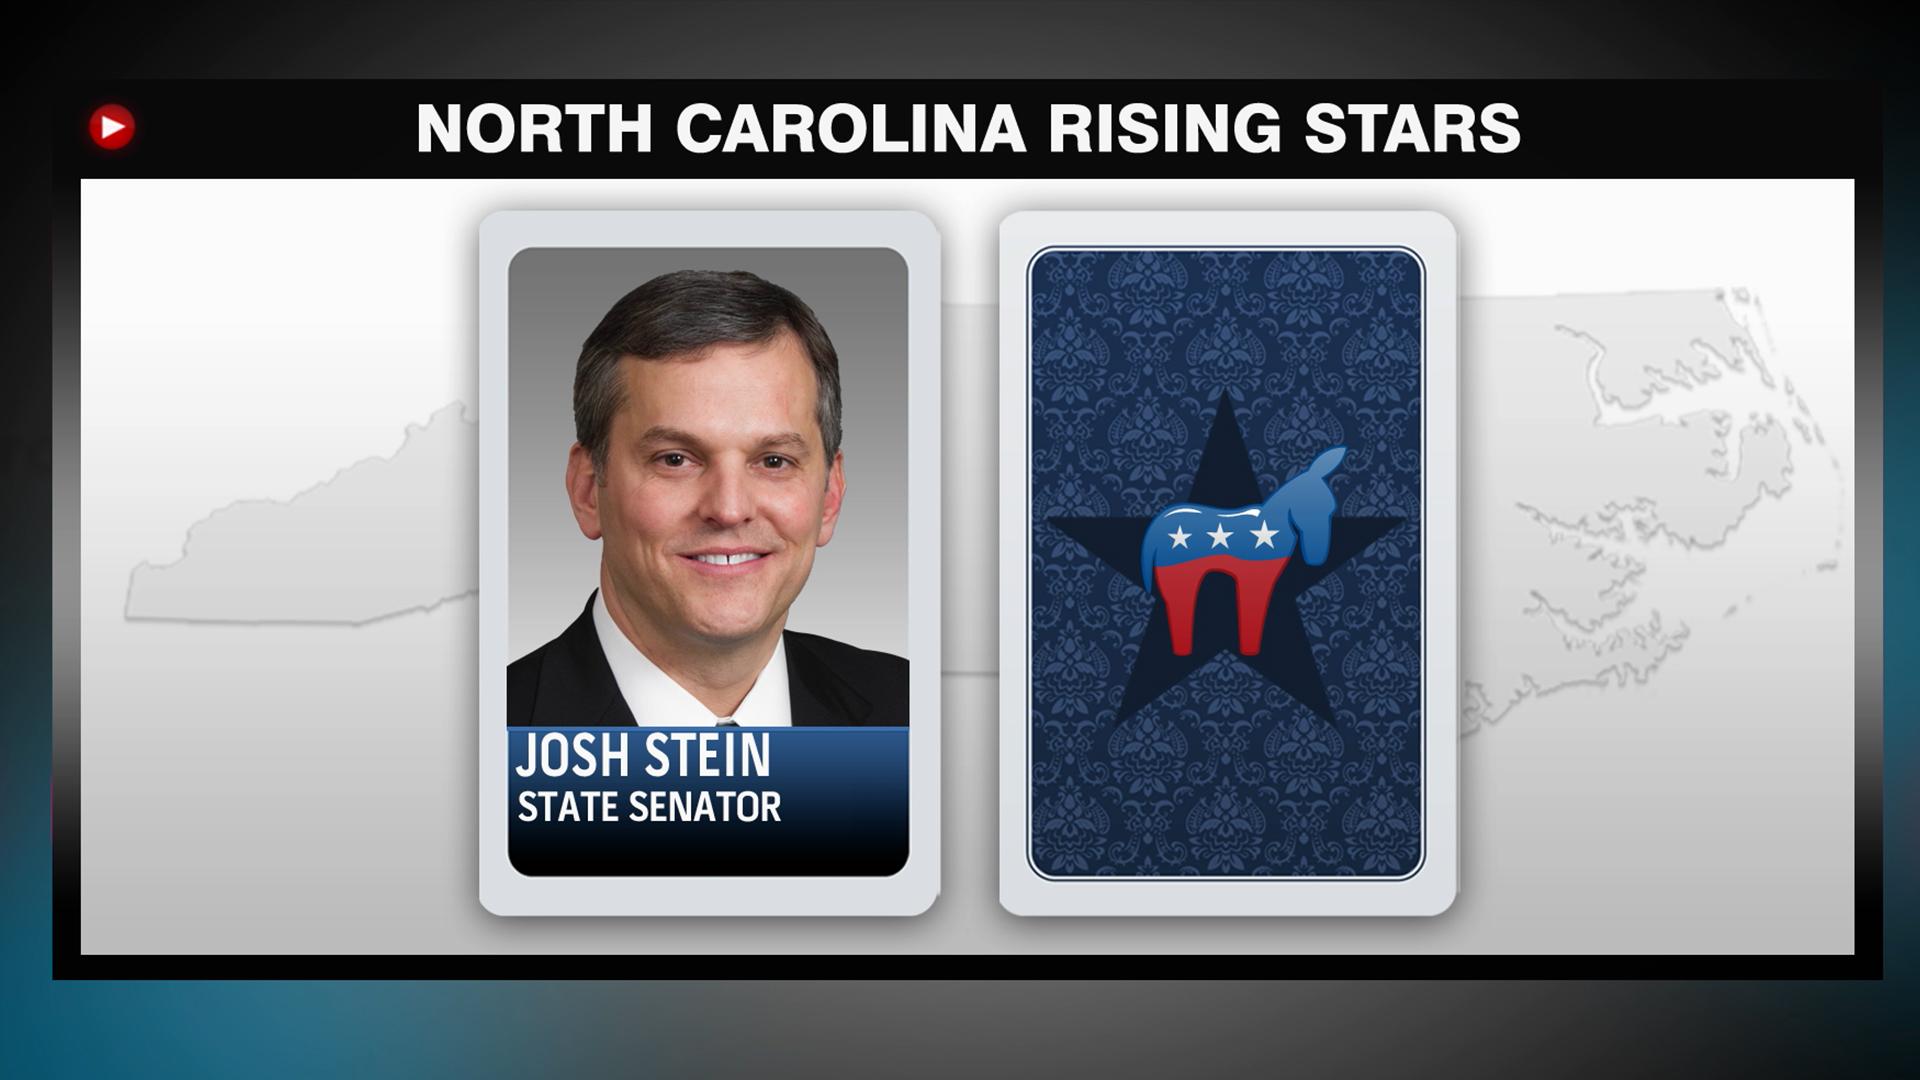 North Carolina's rising political stars